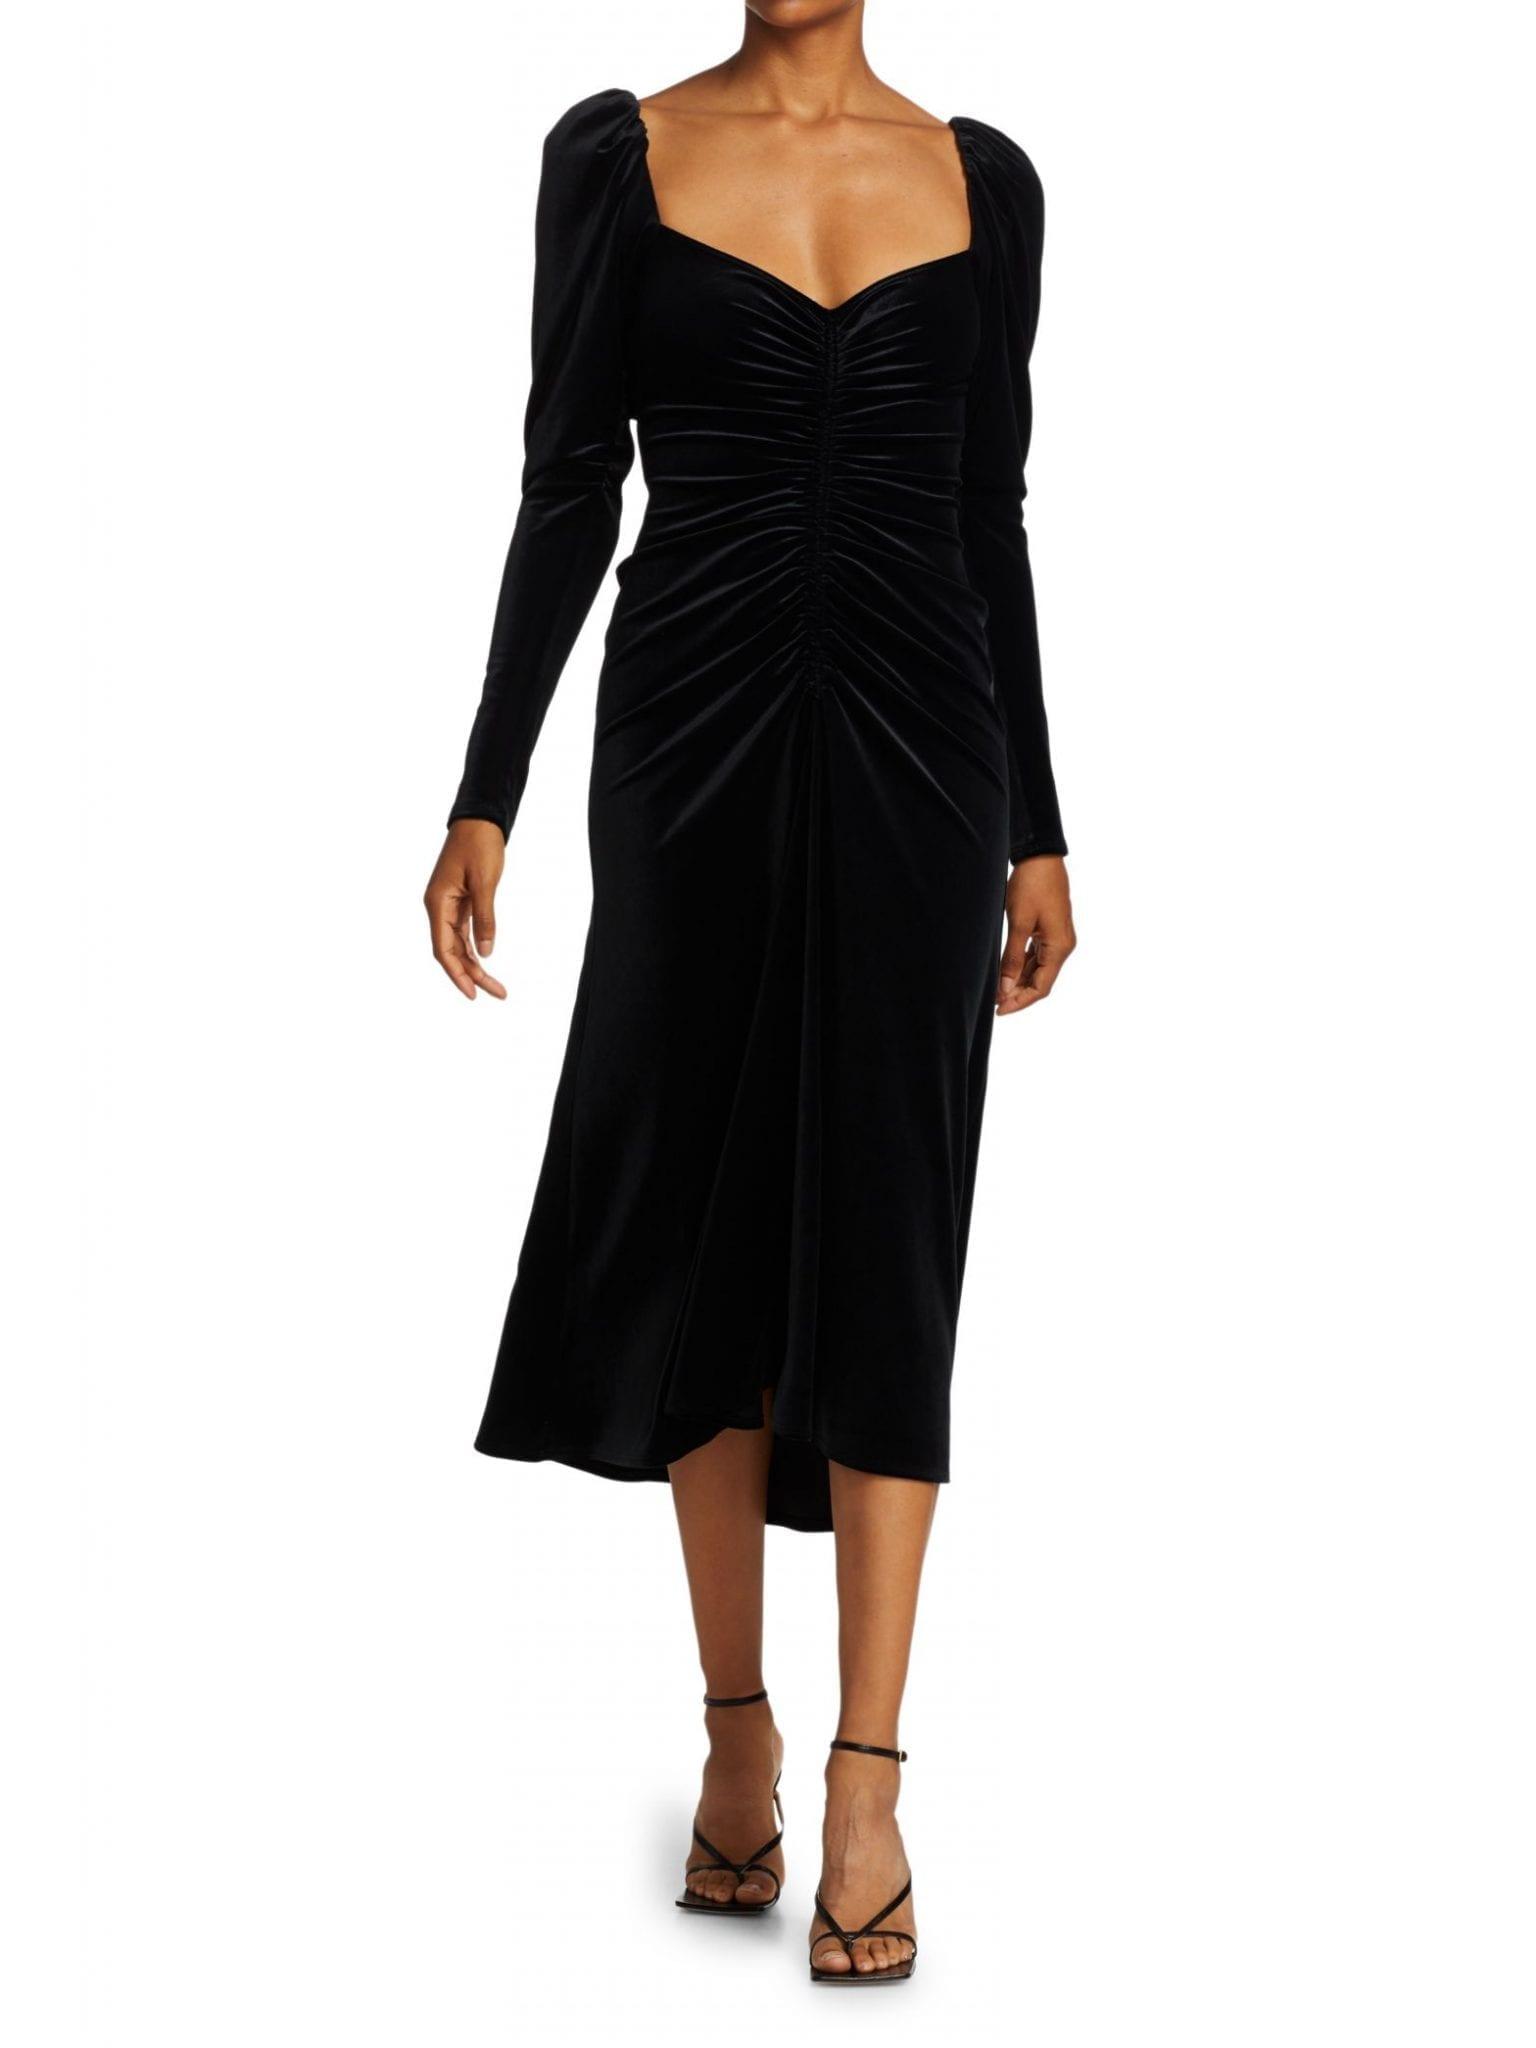 A.L.C. Chamberlain Puff-Sleeve Velvet Midi Dress